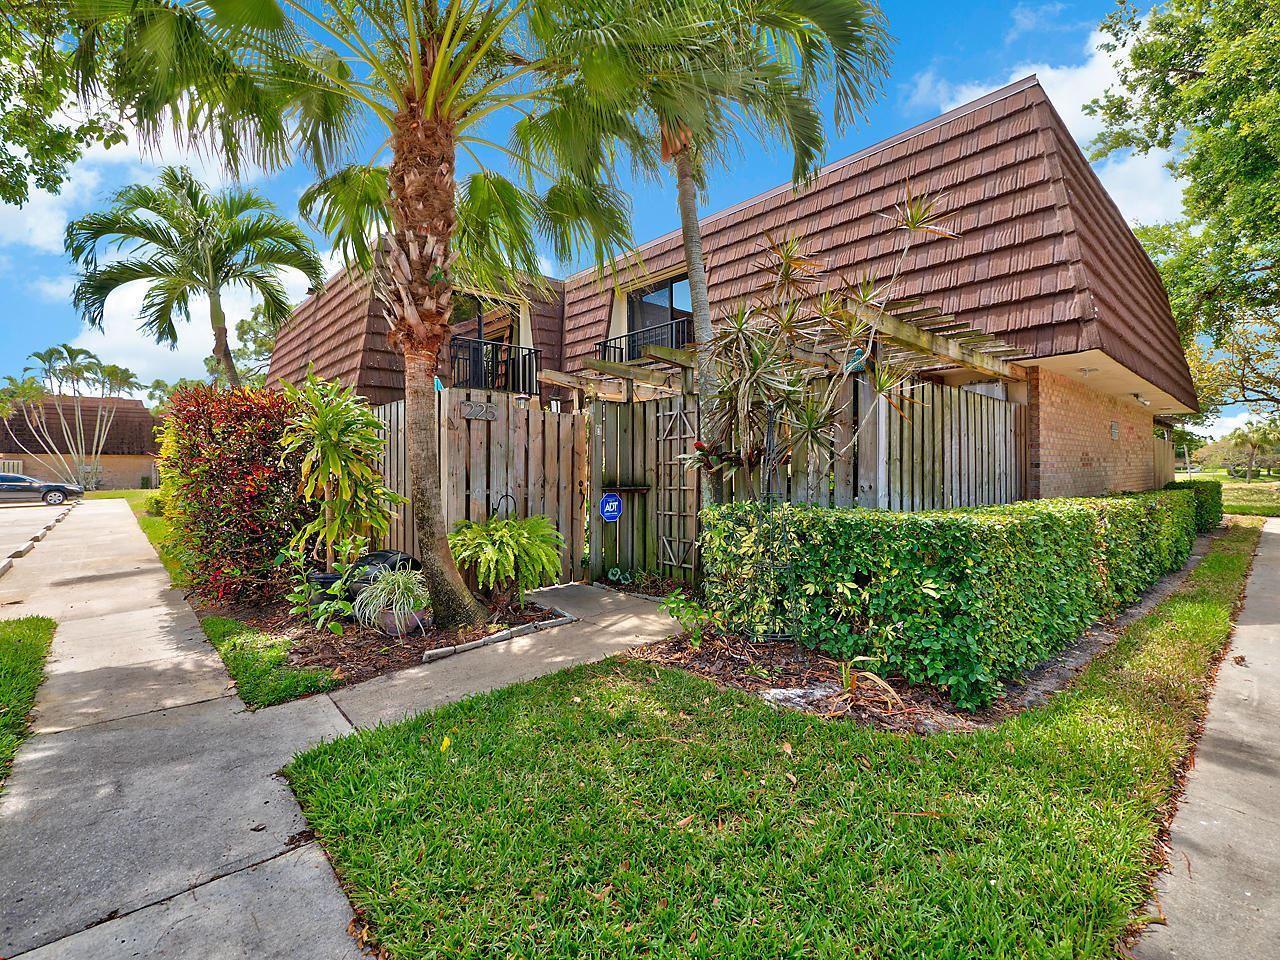 225 2nd Lane, Palm Beach Gardens, FL 33418 - #: RX-10627724